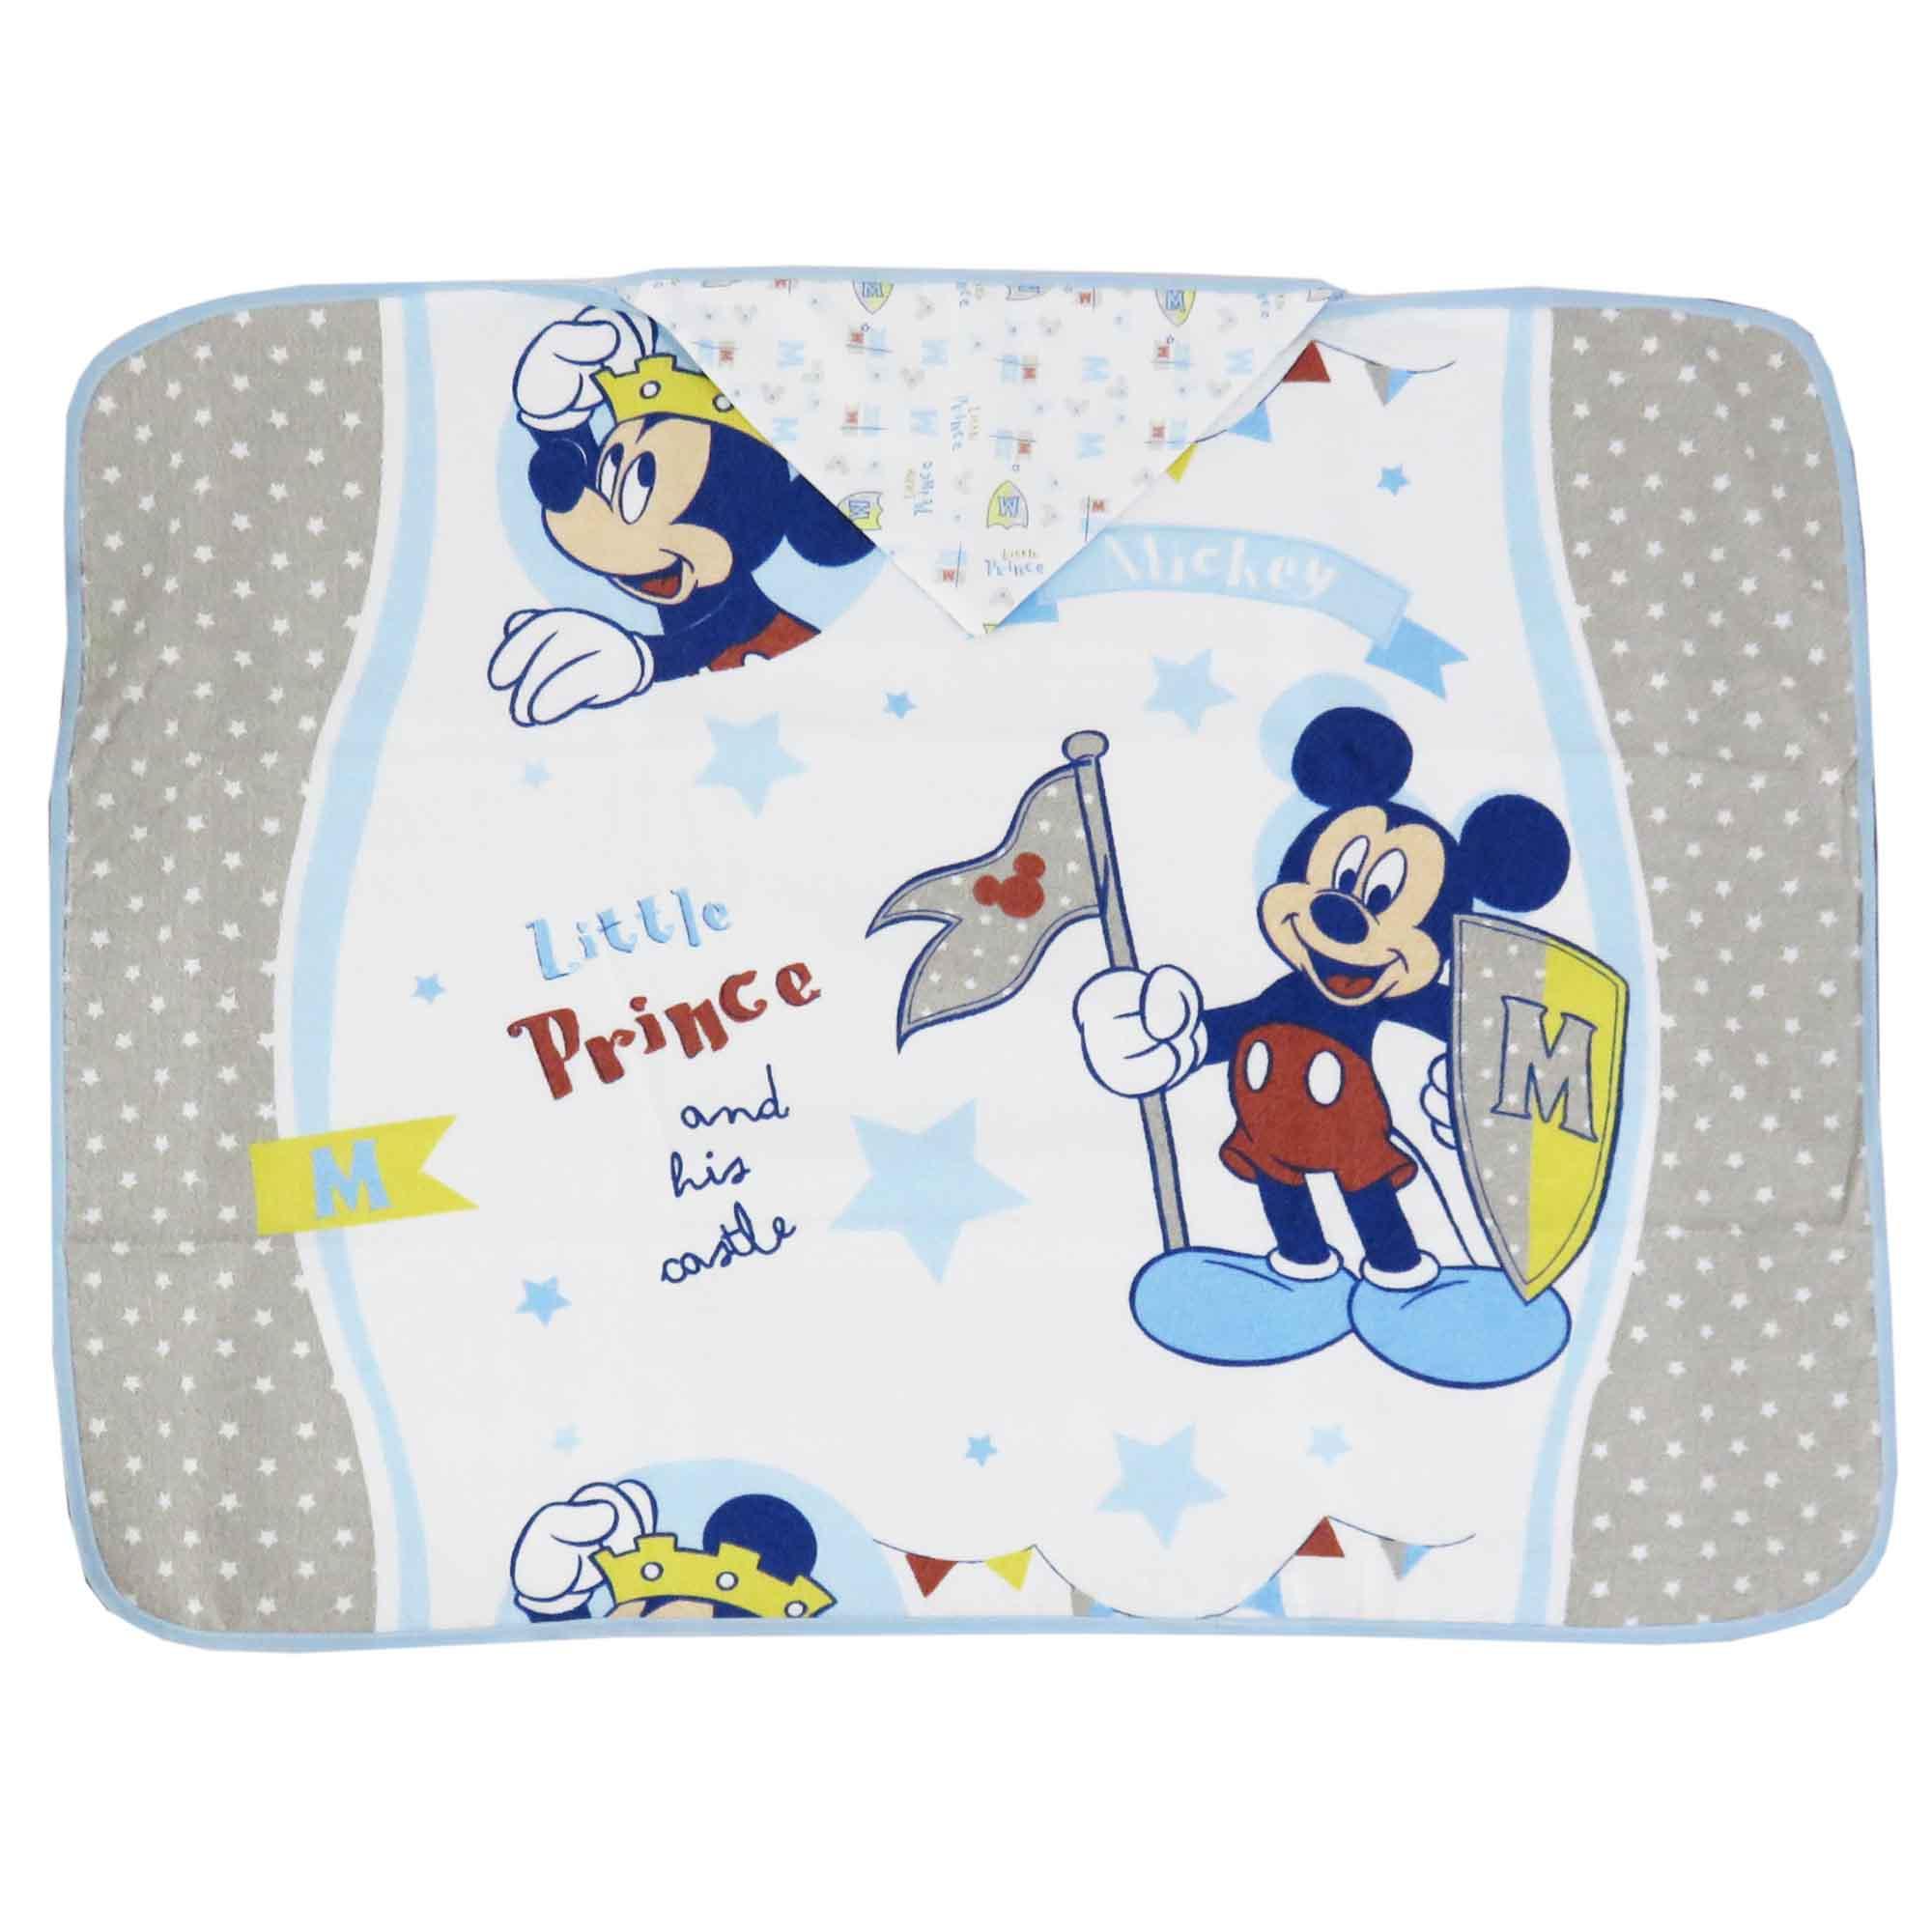 Toalha Estampada Minasrey Disney Com Forro em Fralda - Mickey